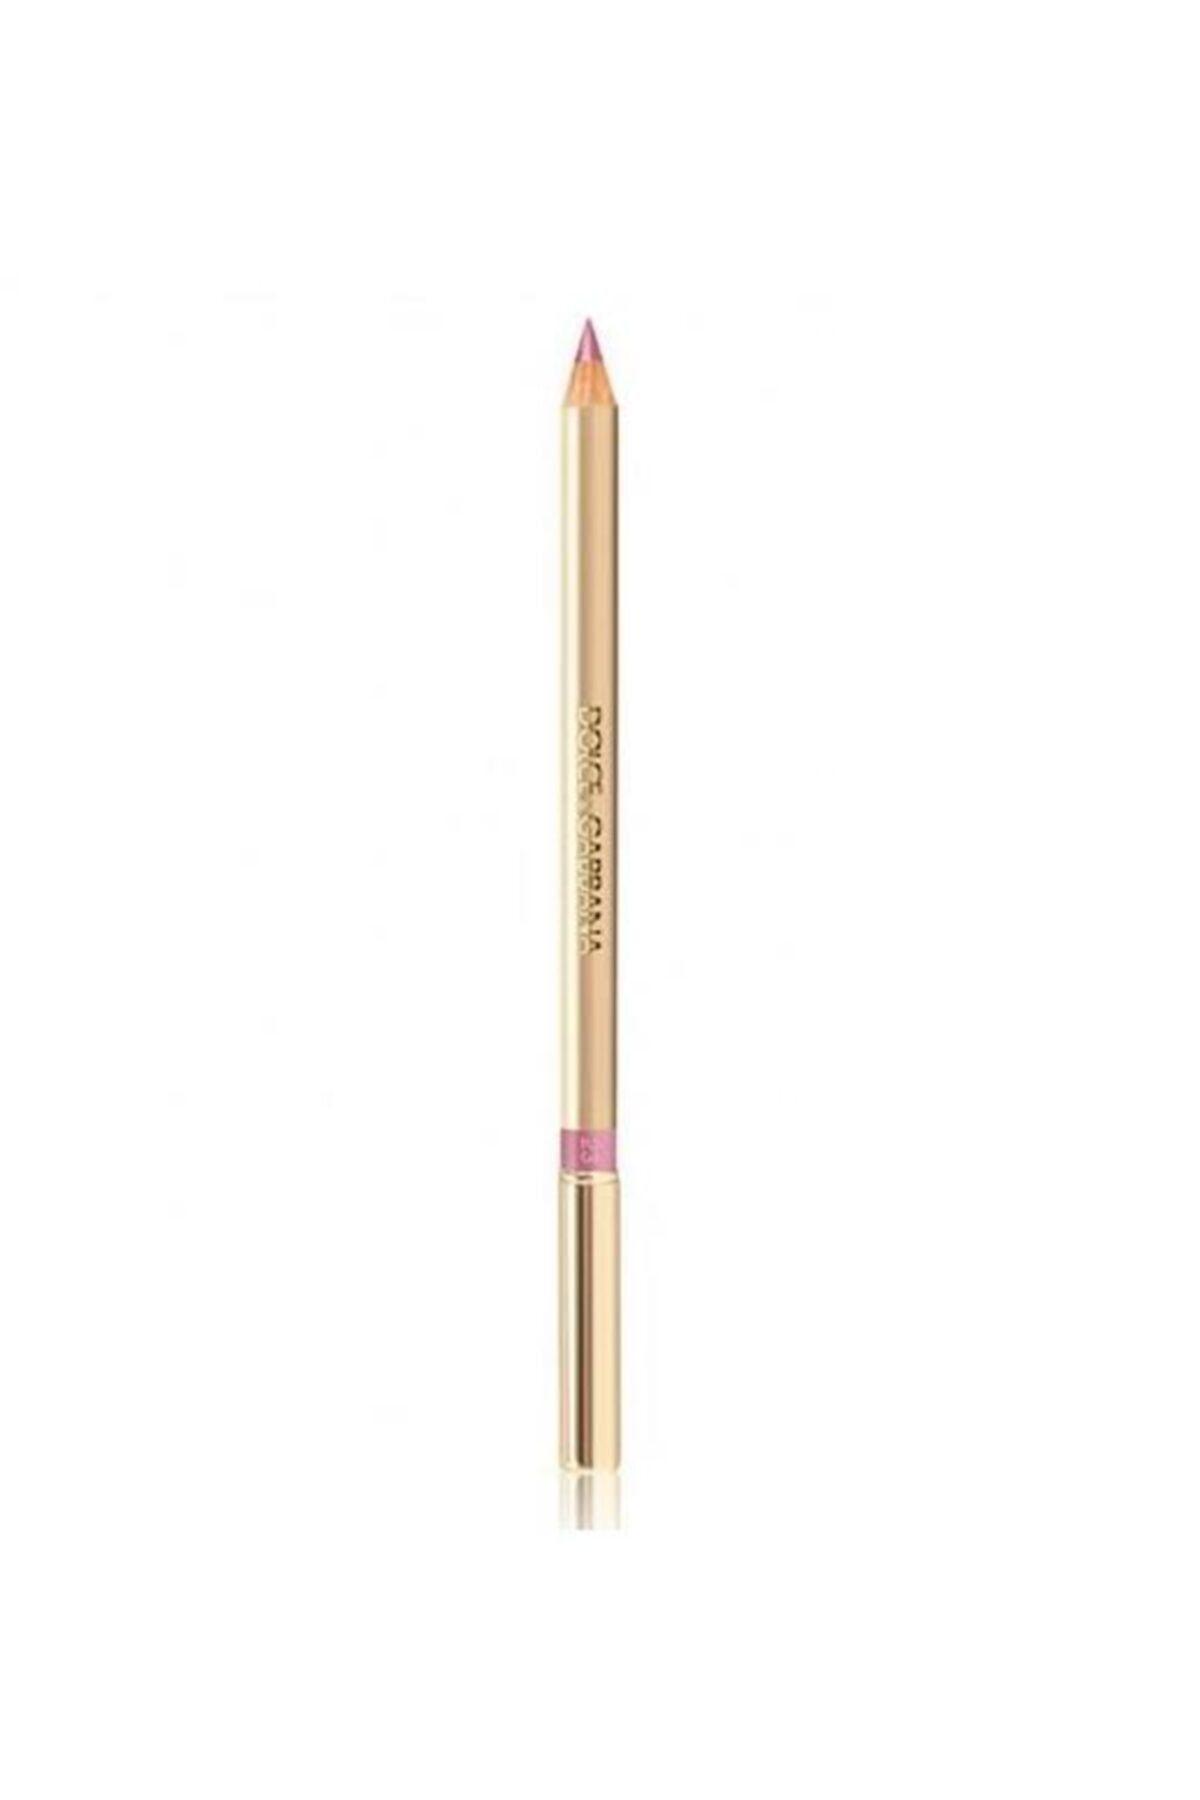 Dolce Gabbana Crayon Intense Göz Kalemi - 23 Pink Pop 3423473033011 1